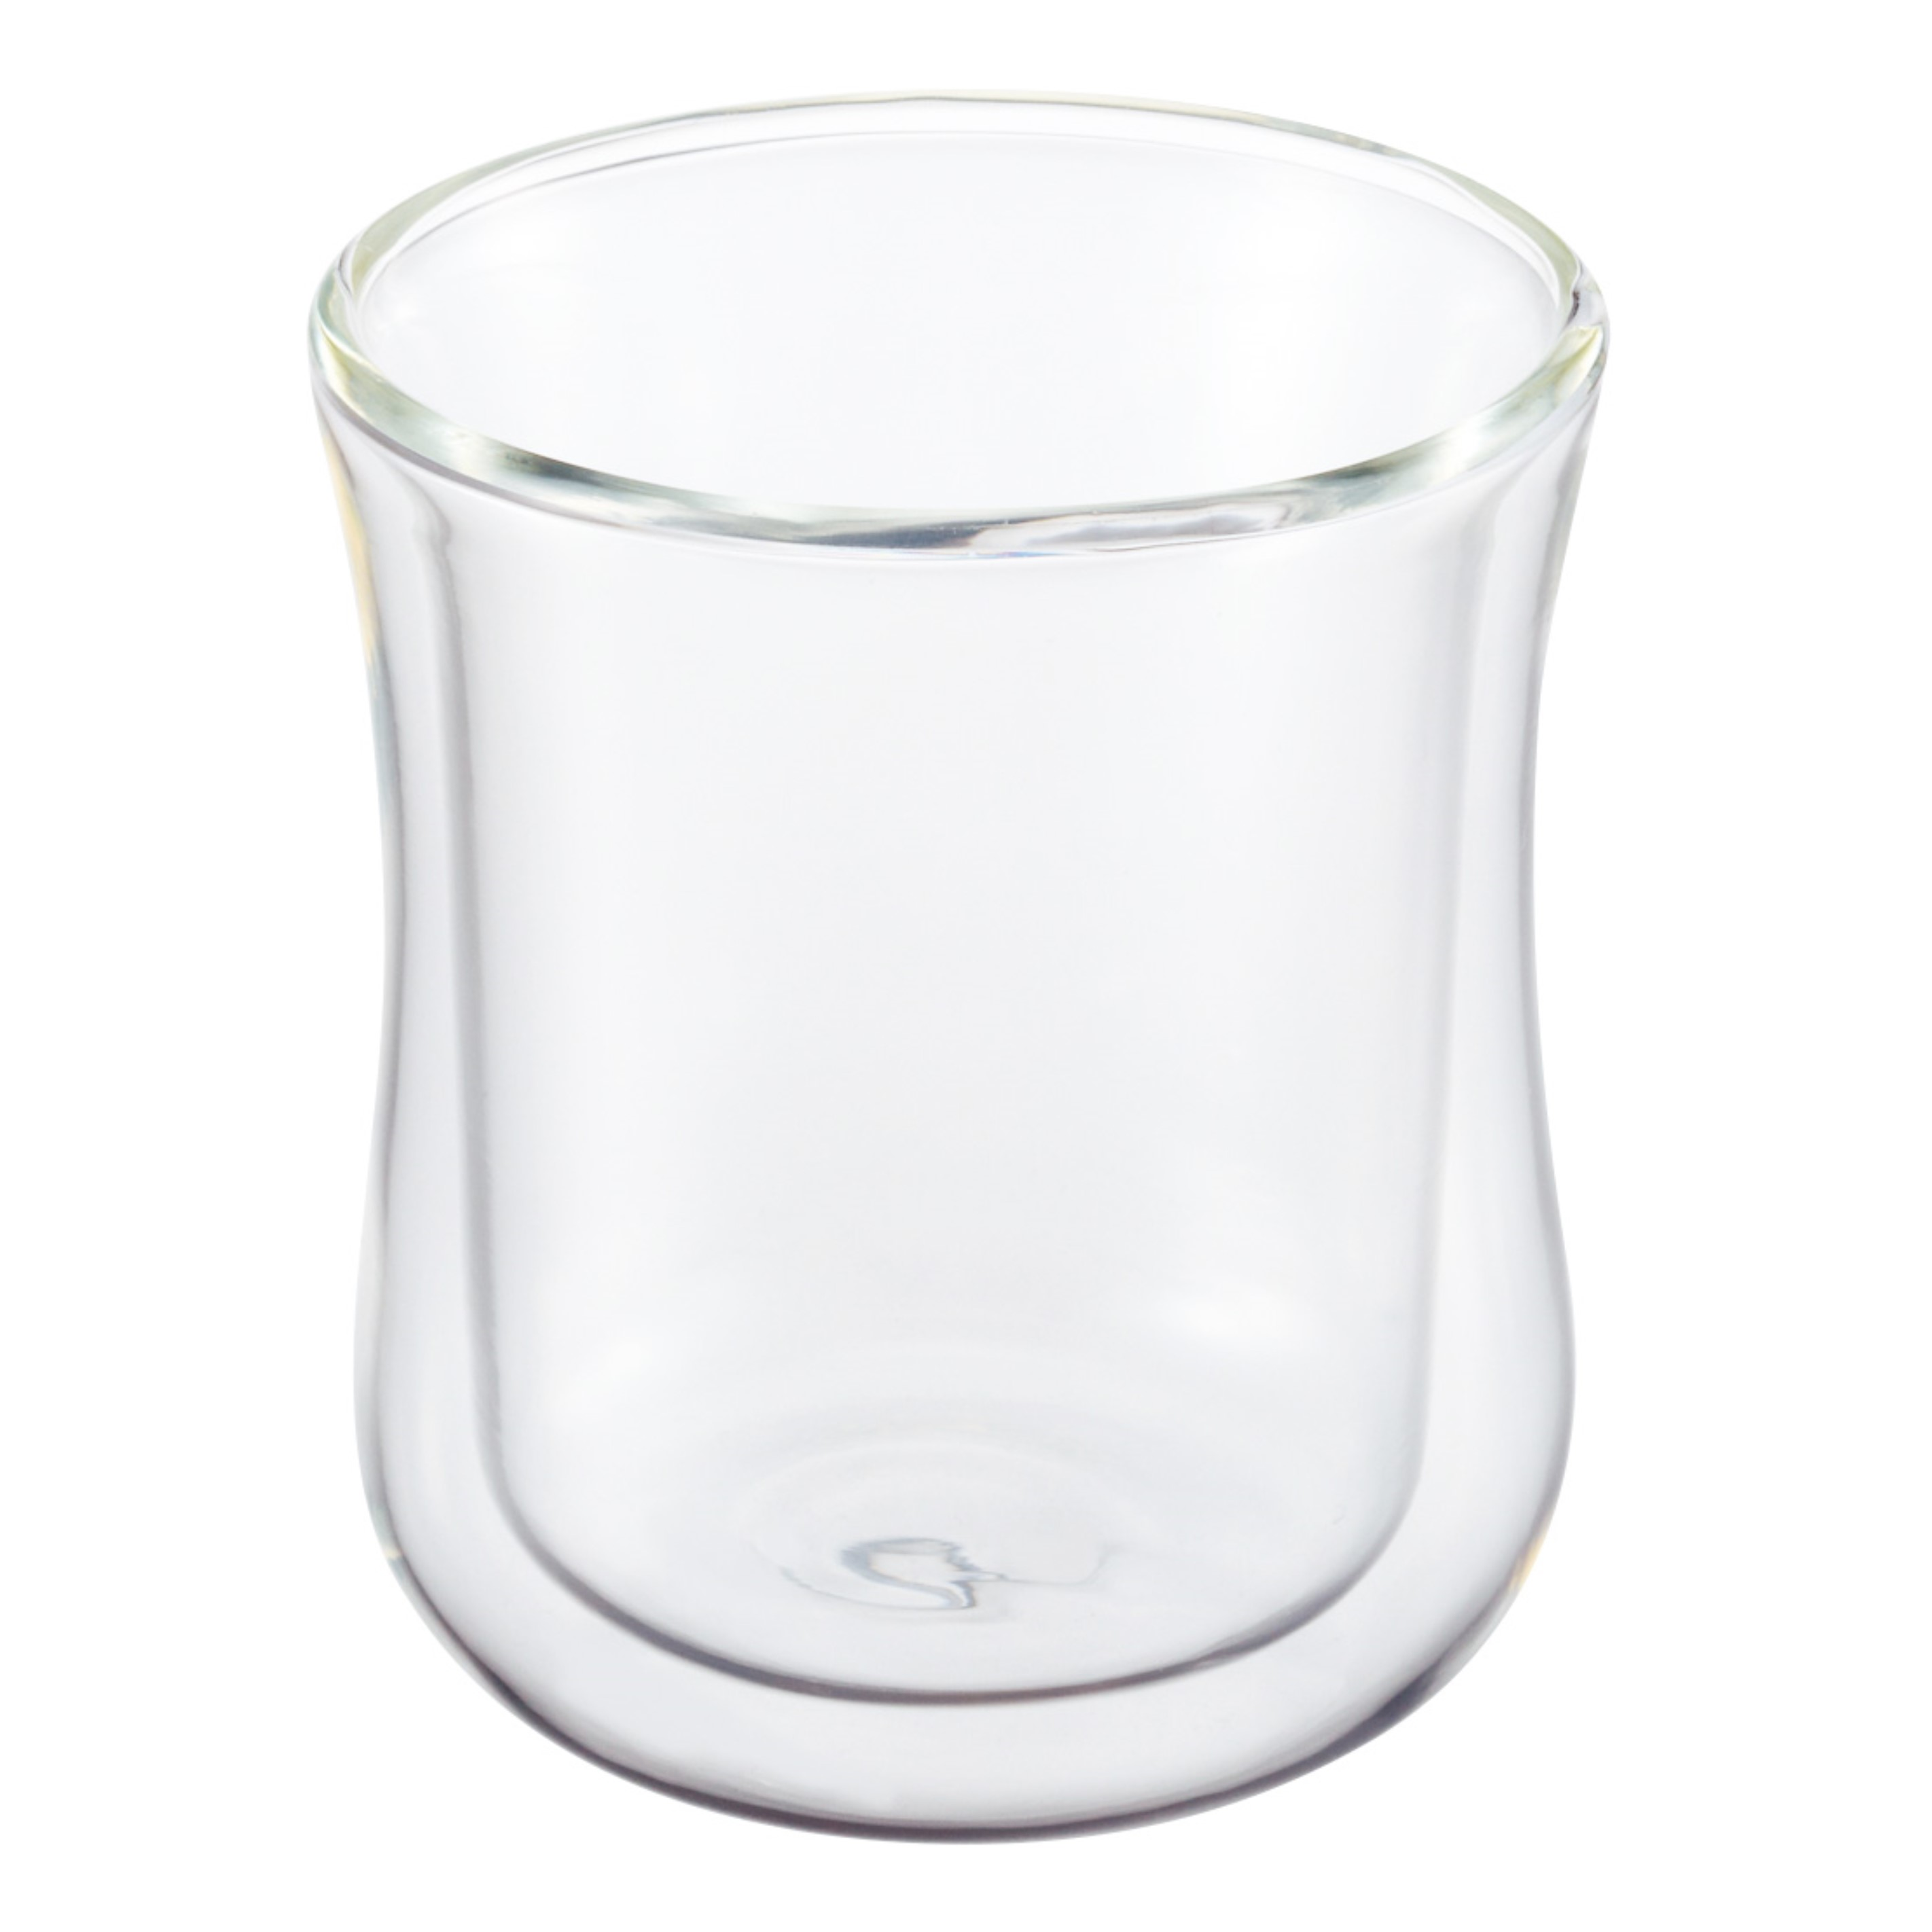 Airグラス(2重構造耐熱ガラス)